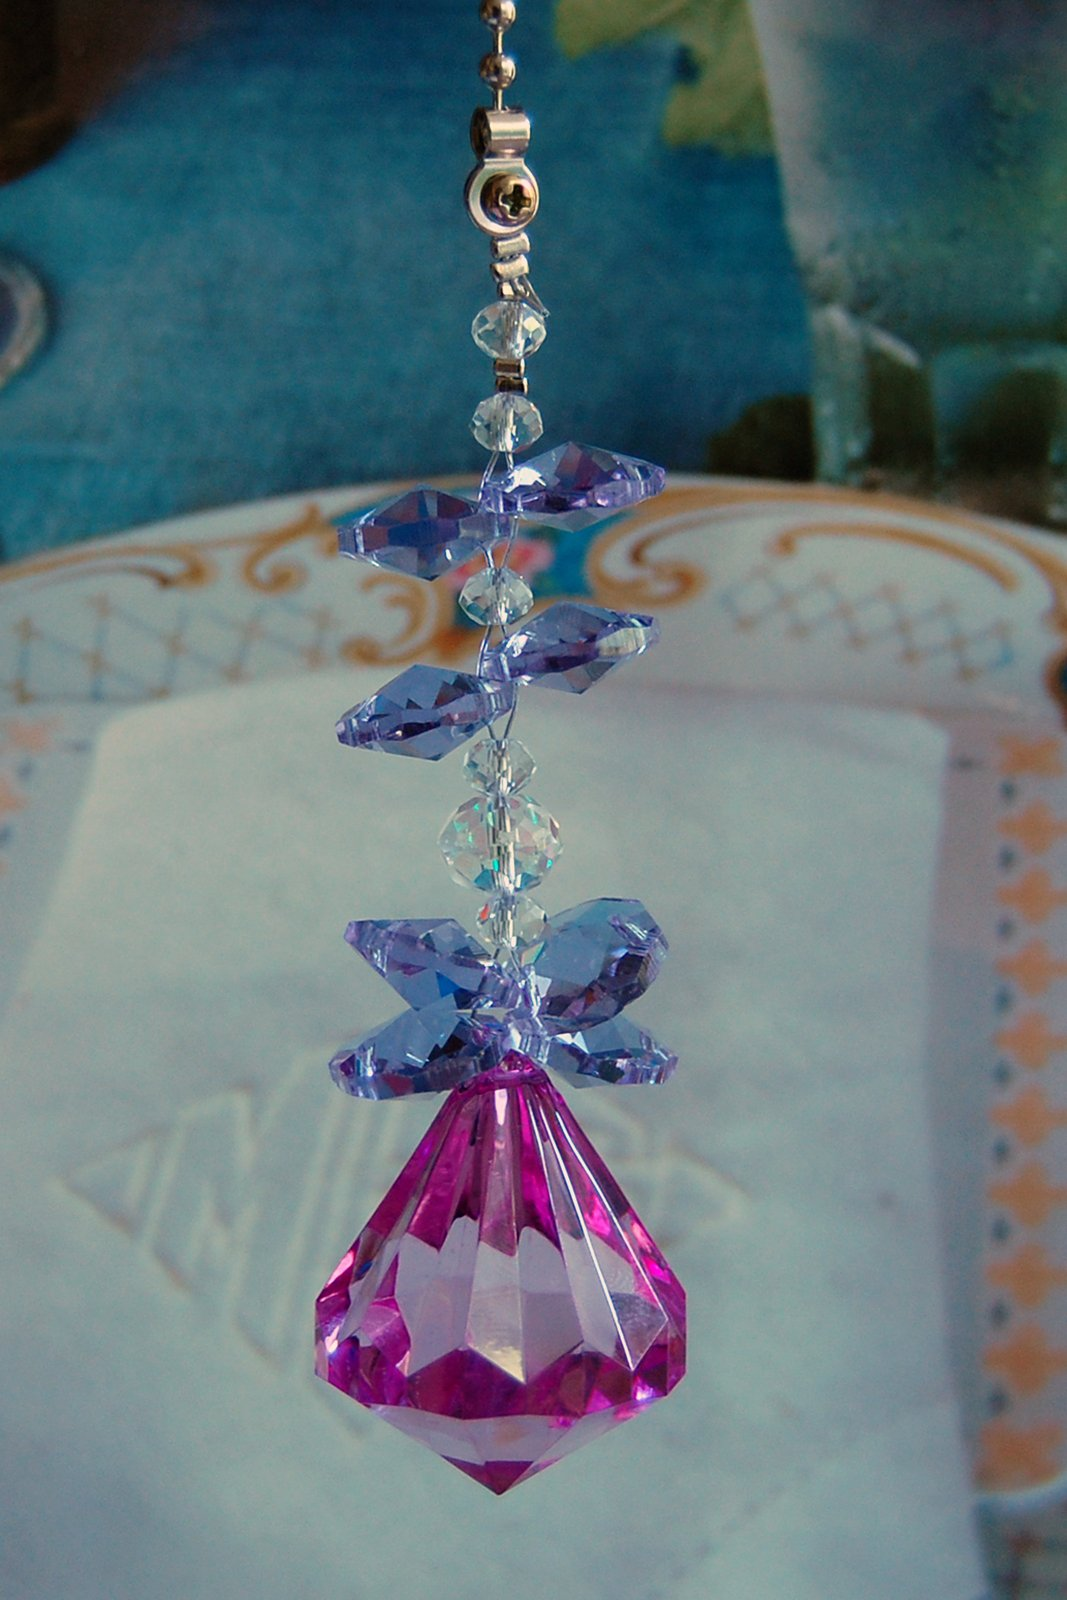 2 of Lilac Acrylic Crystal Diamond Ceiling Lighting Fan Pulls Chain